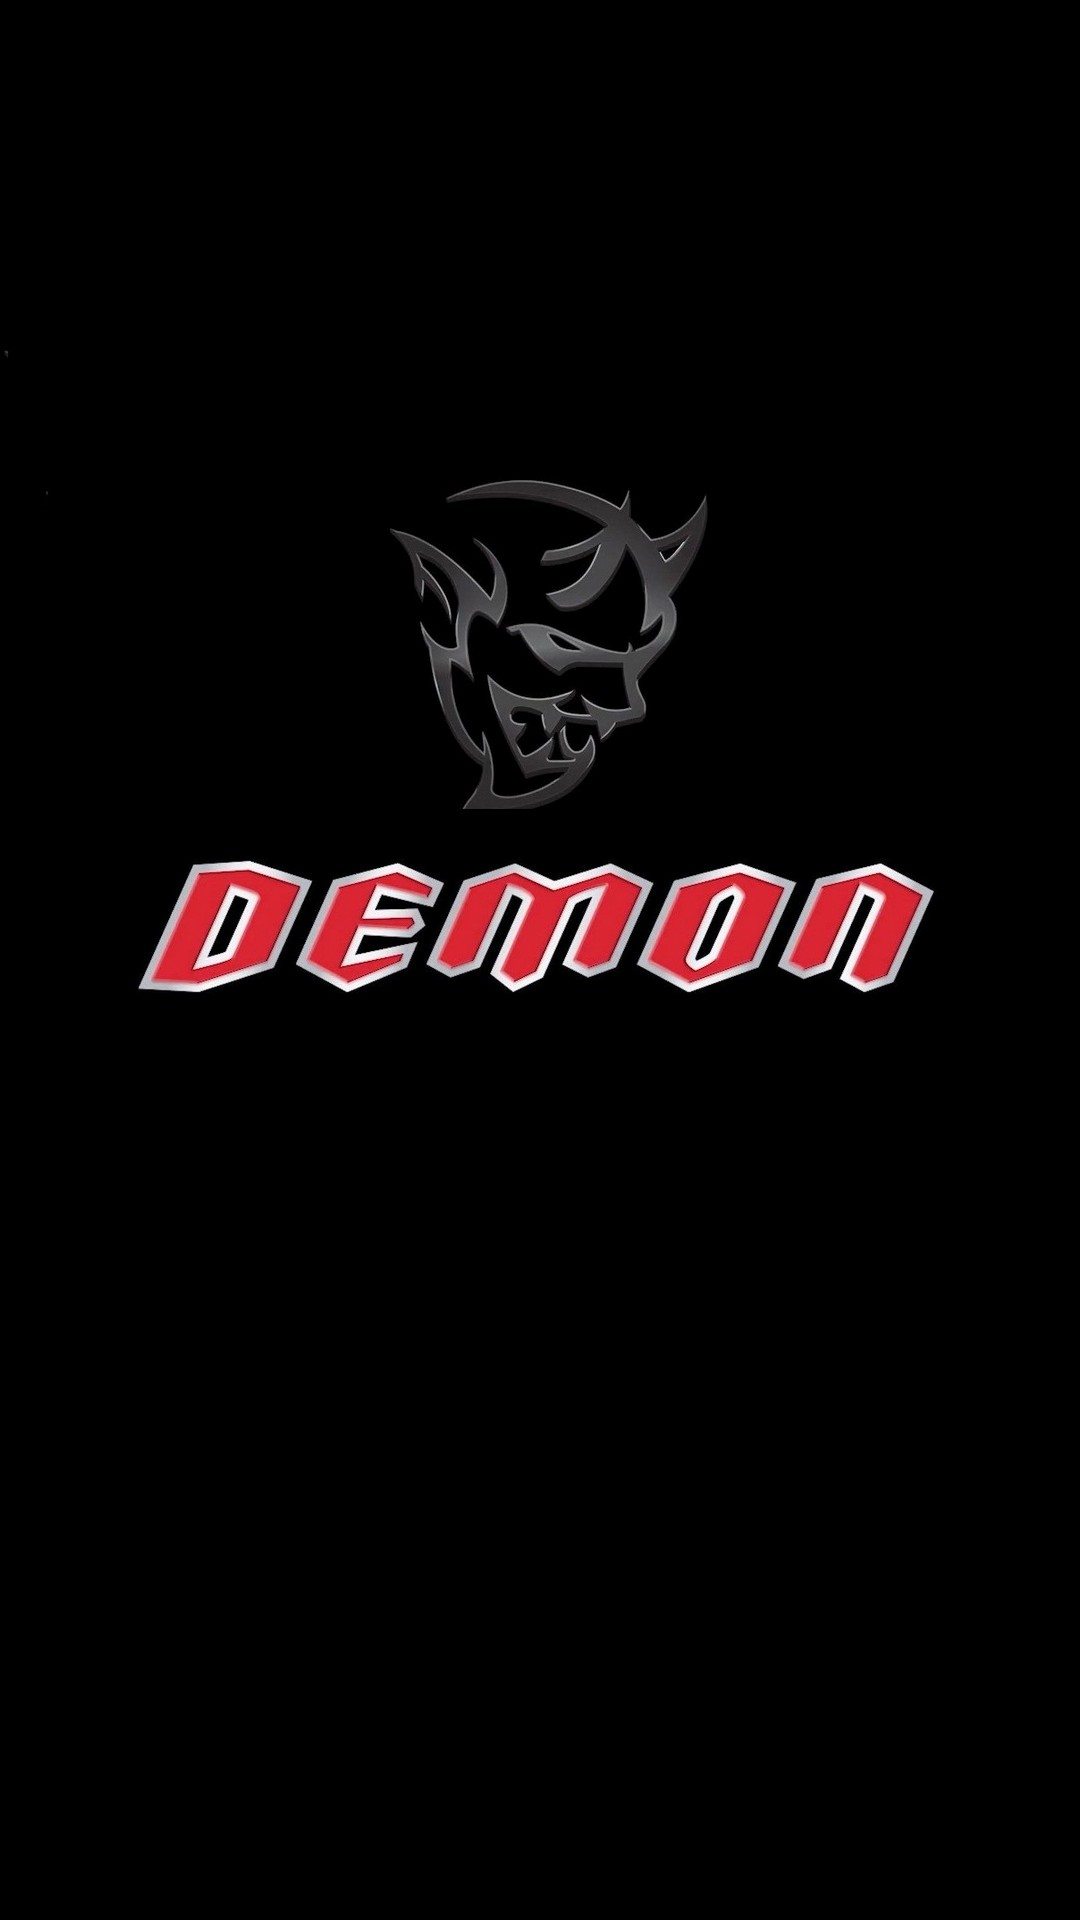 Dodge Demon Logo Iphone Wallpaper Resolution Dodge Demon Logo Iphone 1080x1920 Wallpaper Teahub Io